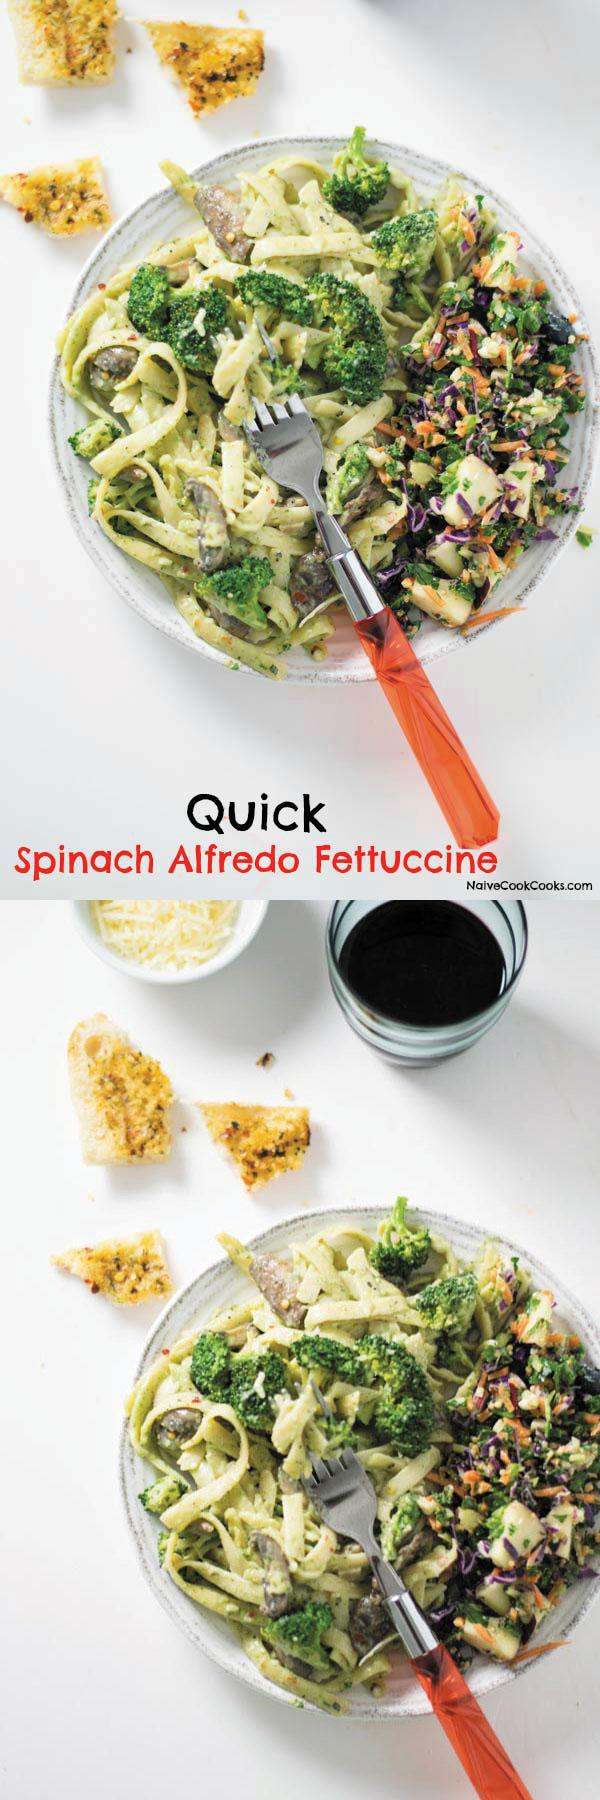 spinach alfredo fettucine